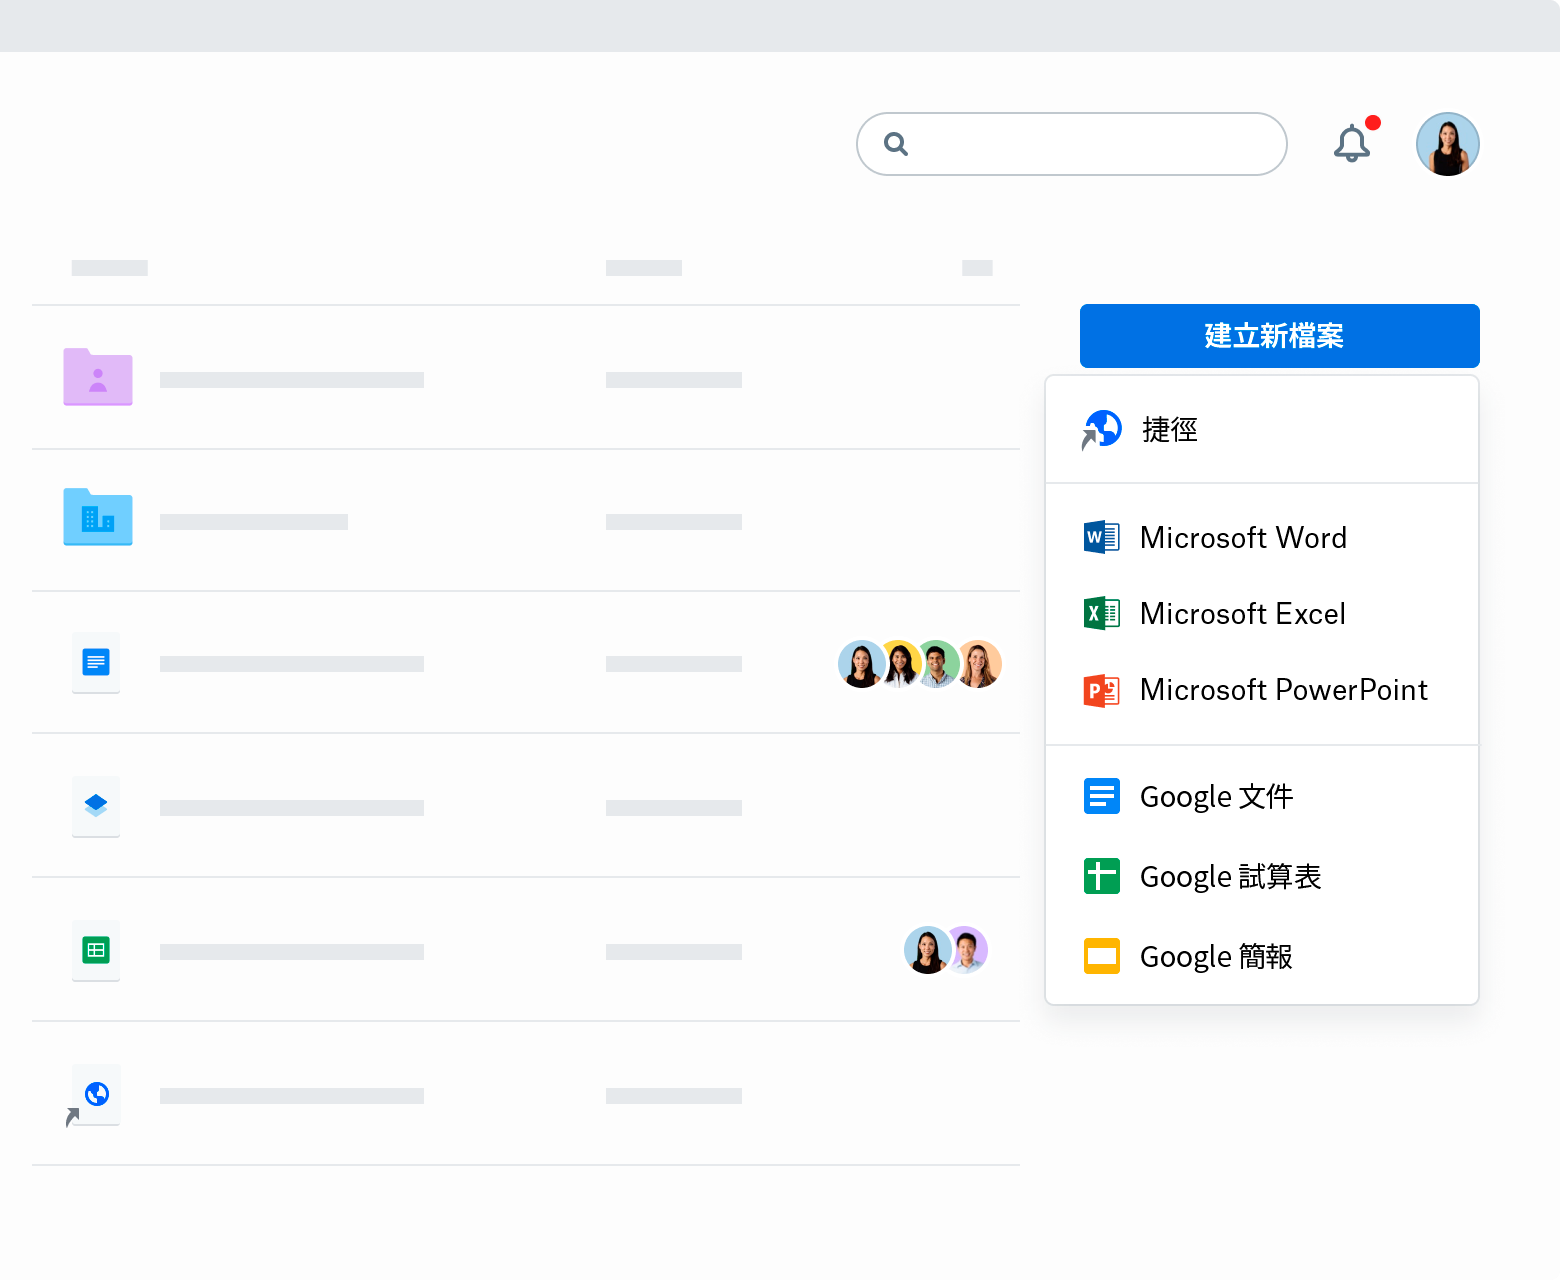 Dropbox.com 中的「建立新檔案」下拉式選單螢幕截圖。選單會列出捷徑、Microsoft Word、Microsoft Excel、Microsoft PowerPoint、Google 文件、Google 試算表與 Google 簡報。